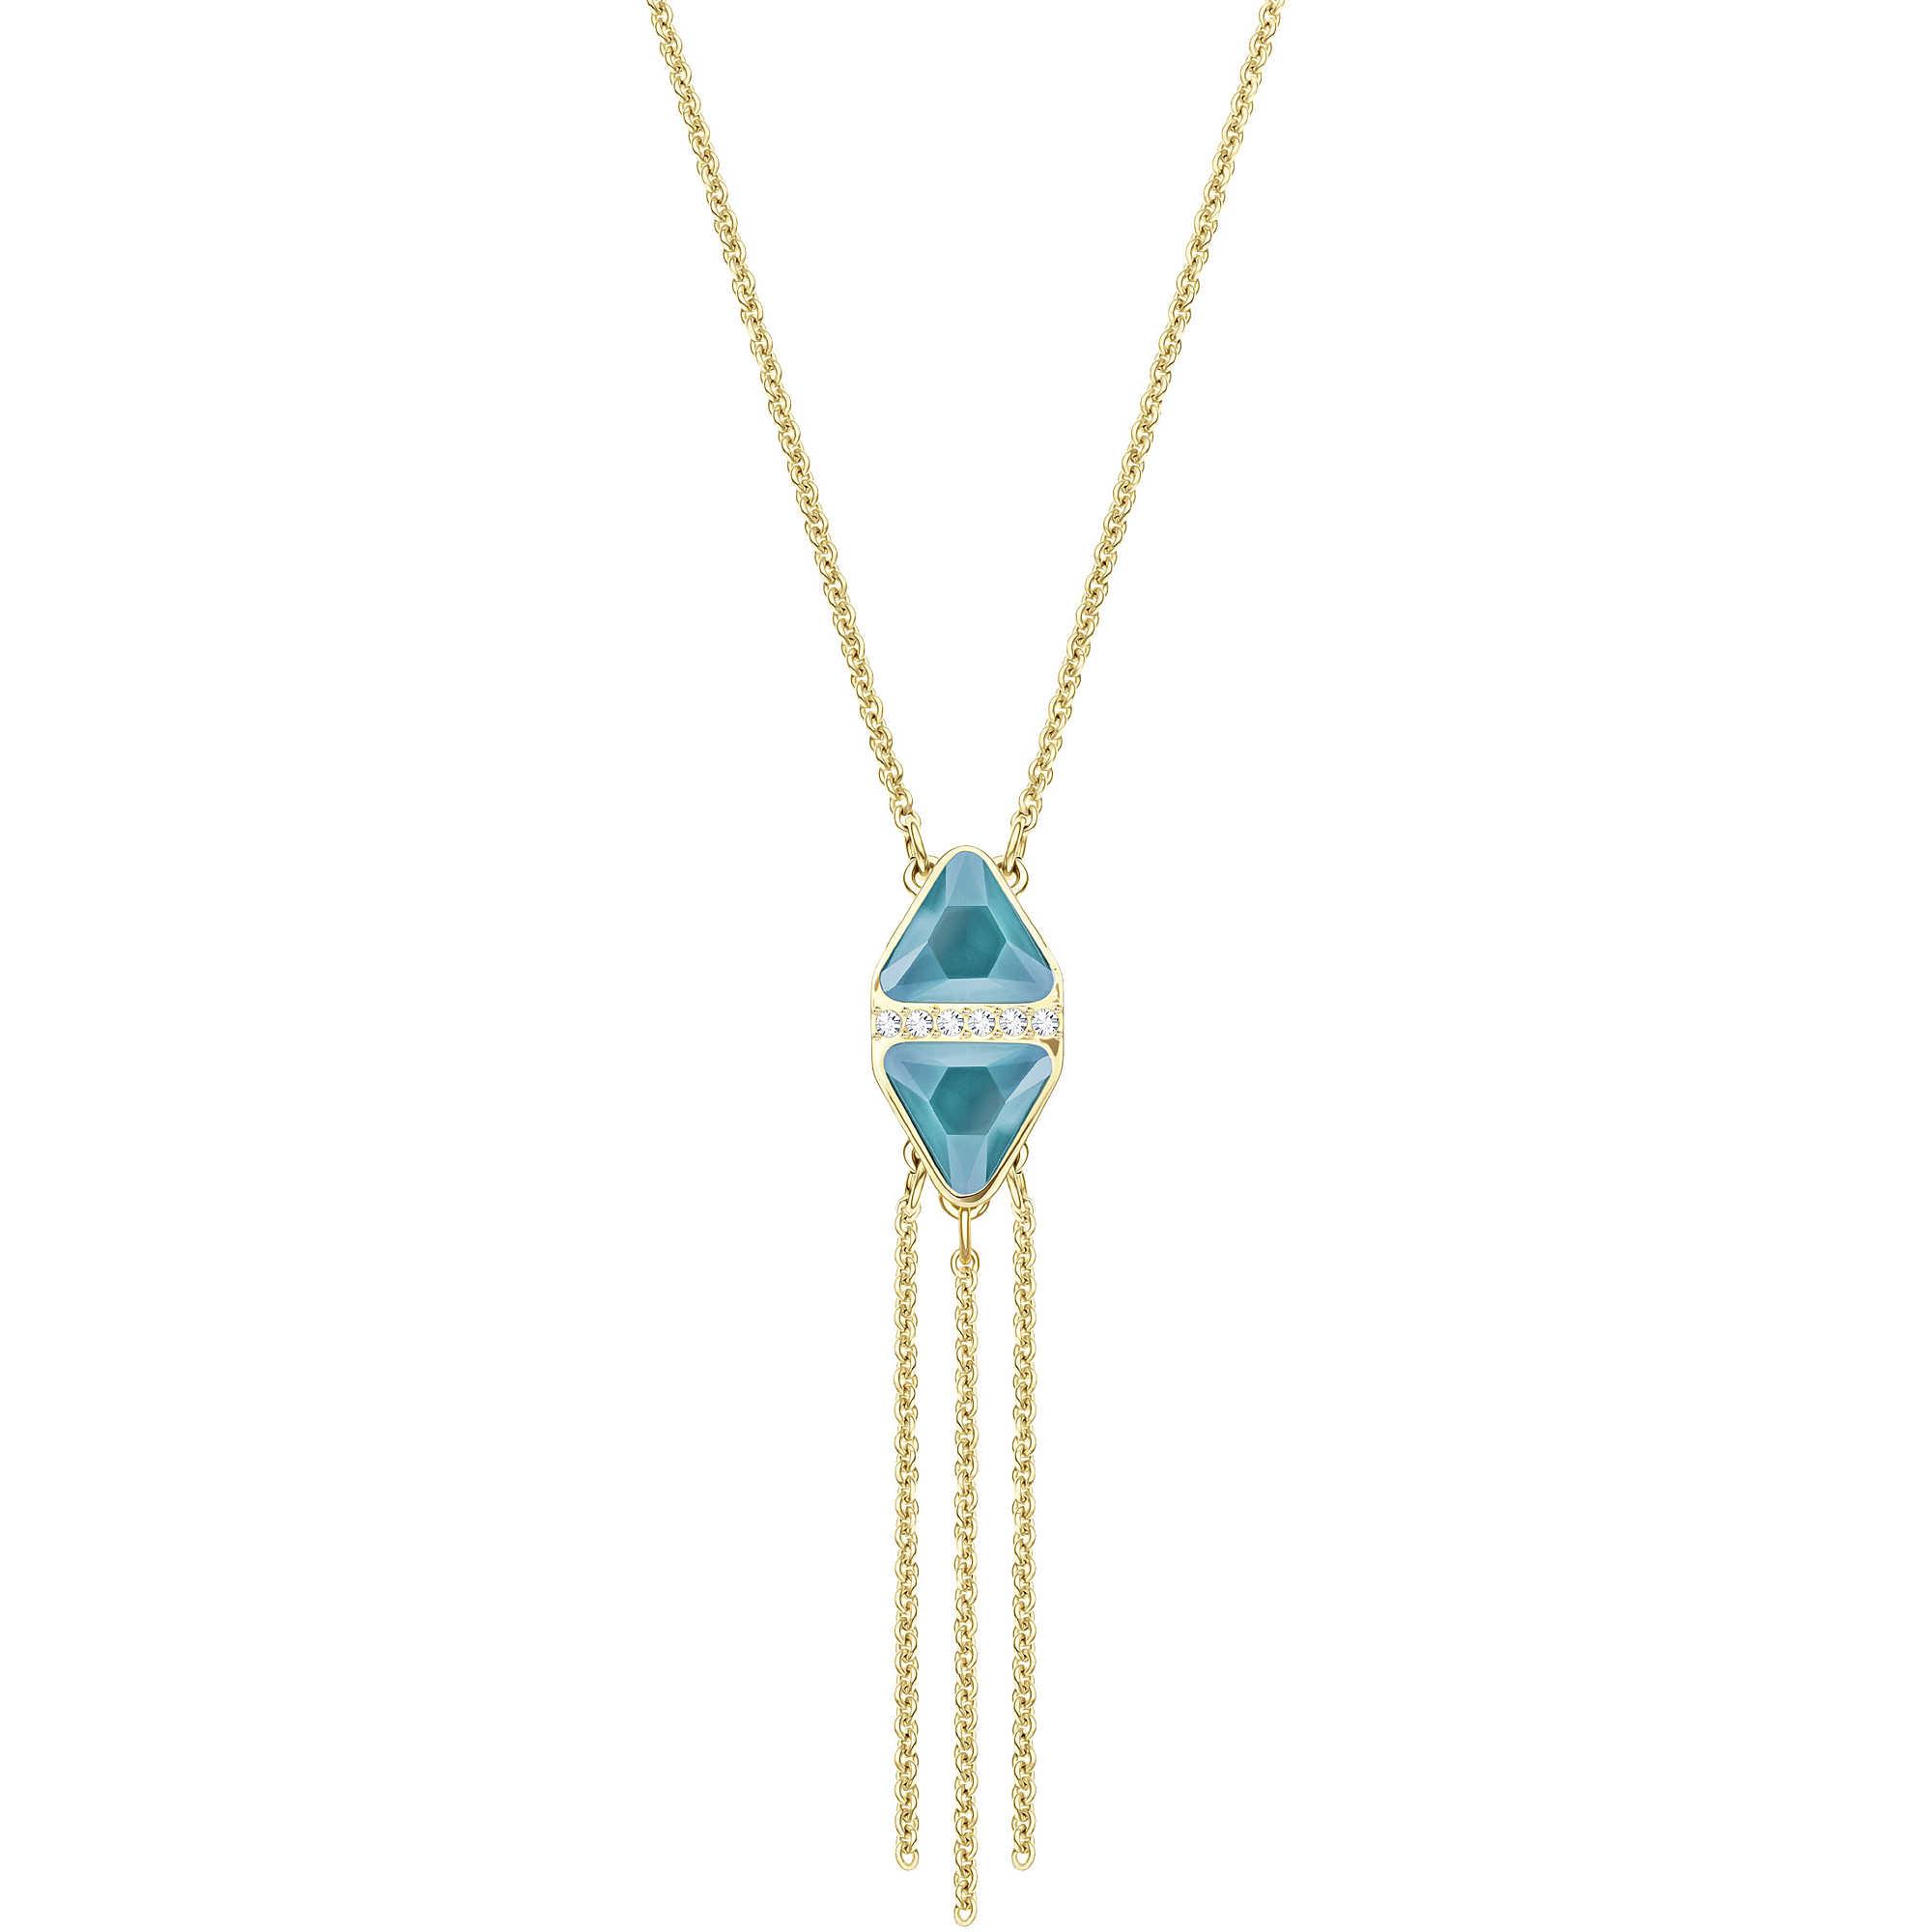 itm necklace collana gabbana love jewel d ferrari dolce ebay immagine g